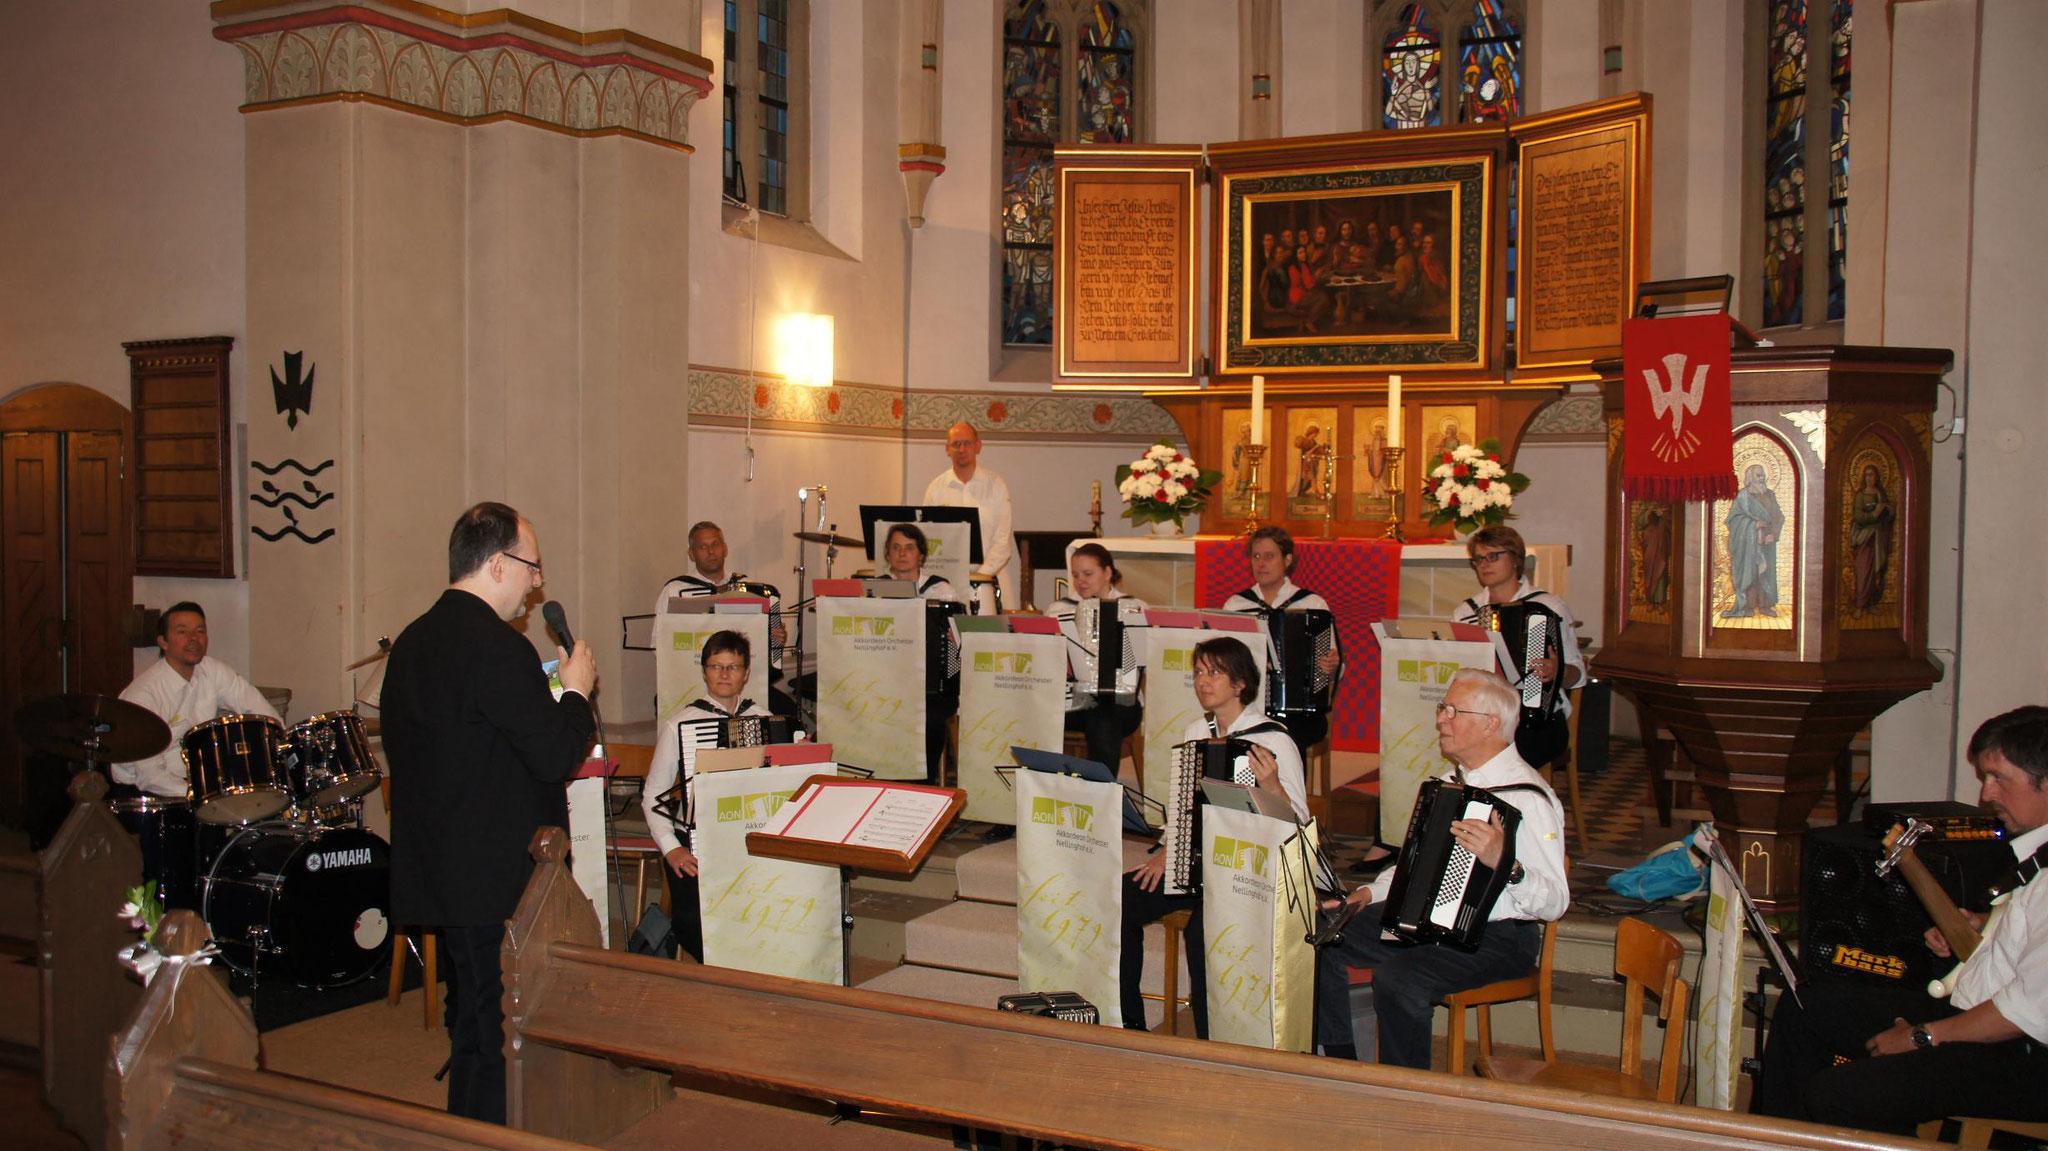 Begrüßung zum Konzert in der Apostel-Kirche Neuenkirchen zum 125 jährigen Jubiläum